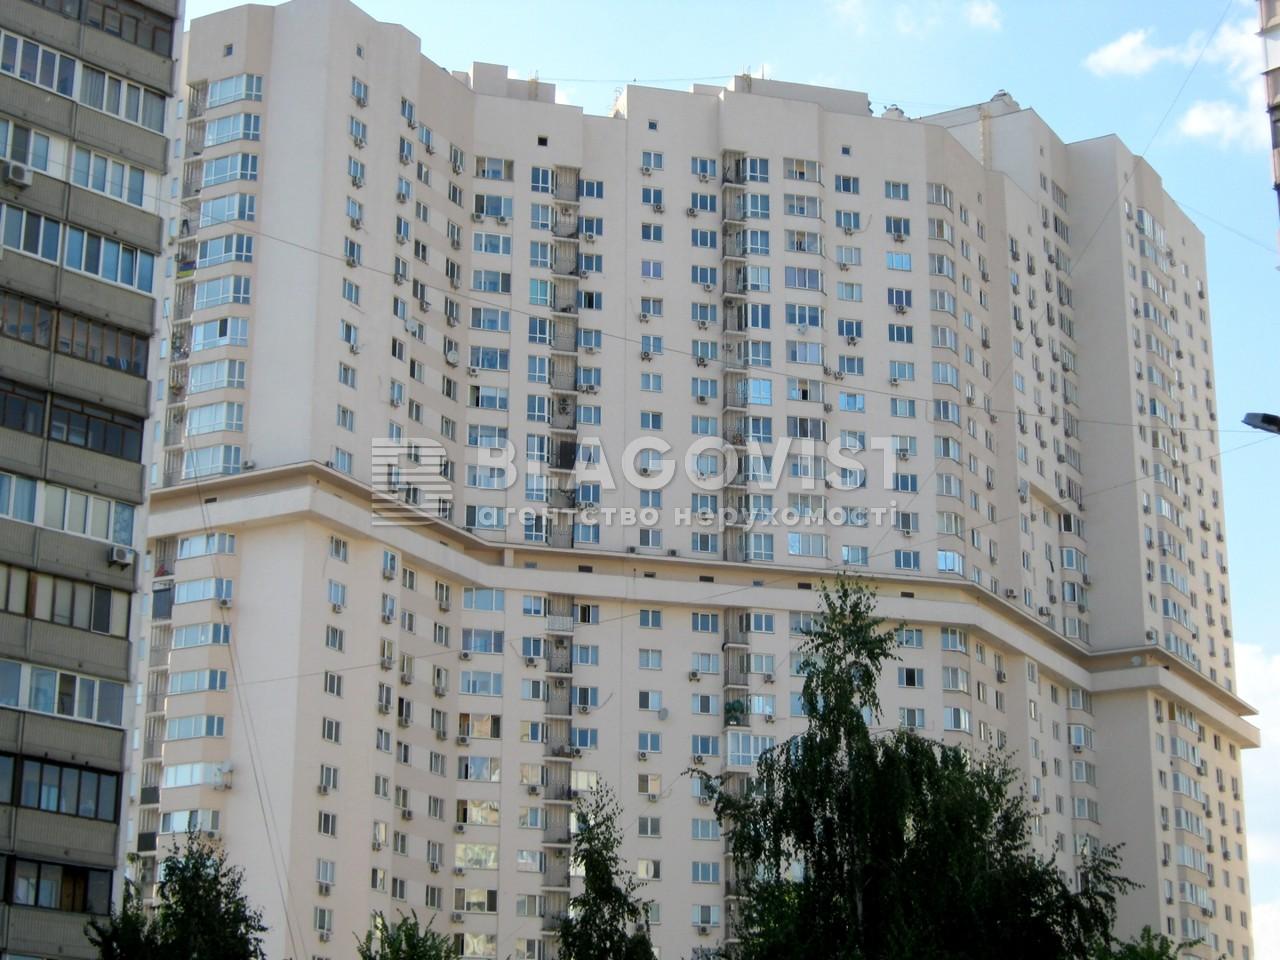 Нежитлове приміщення, H-38383, Мишуги О., Київ - Фото 1